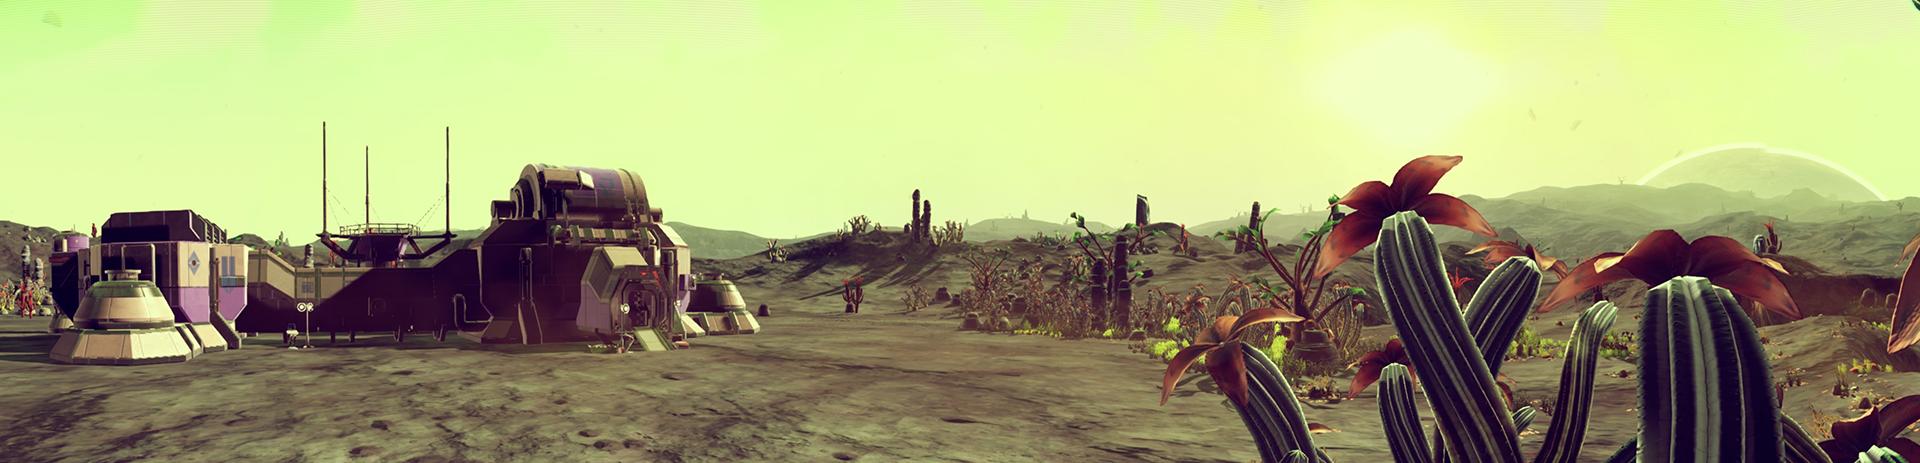 panorama05_resize.png